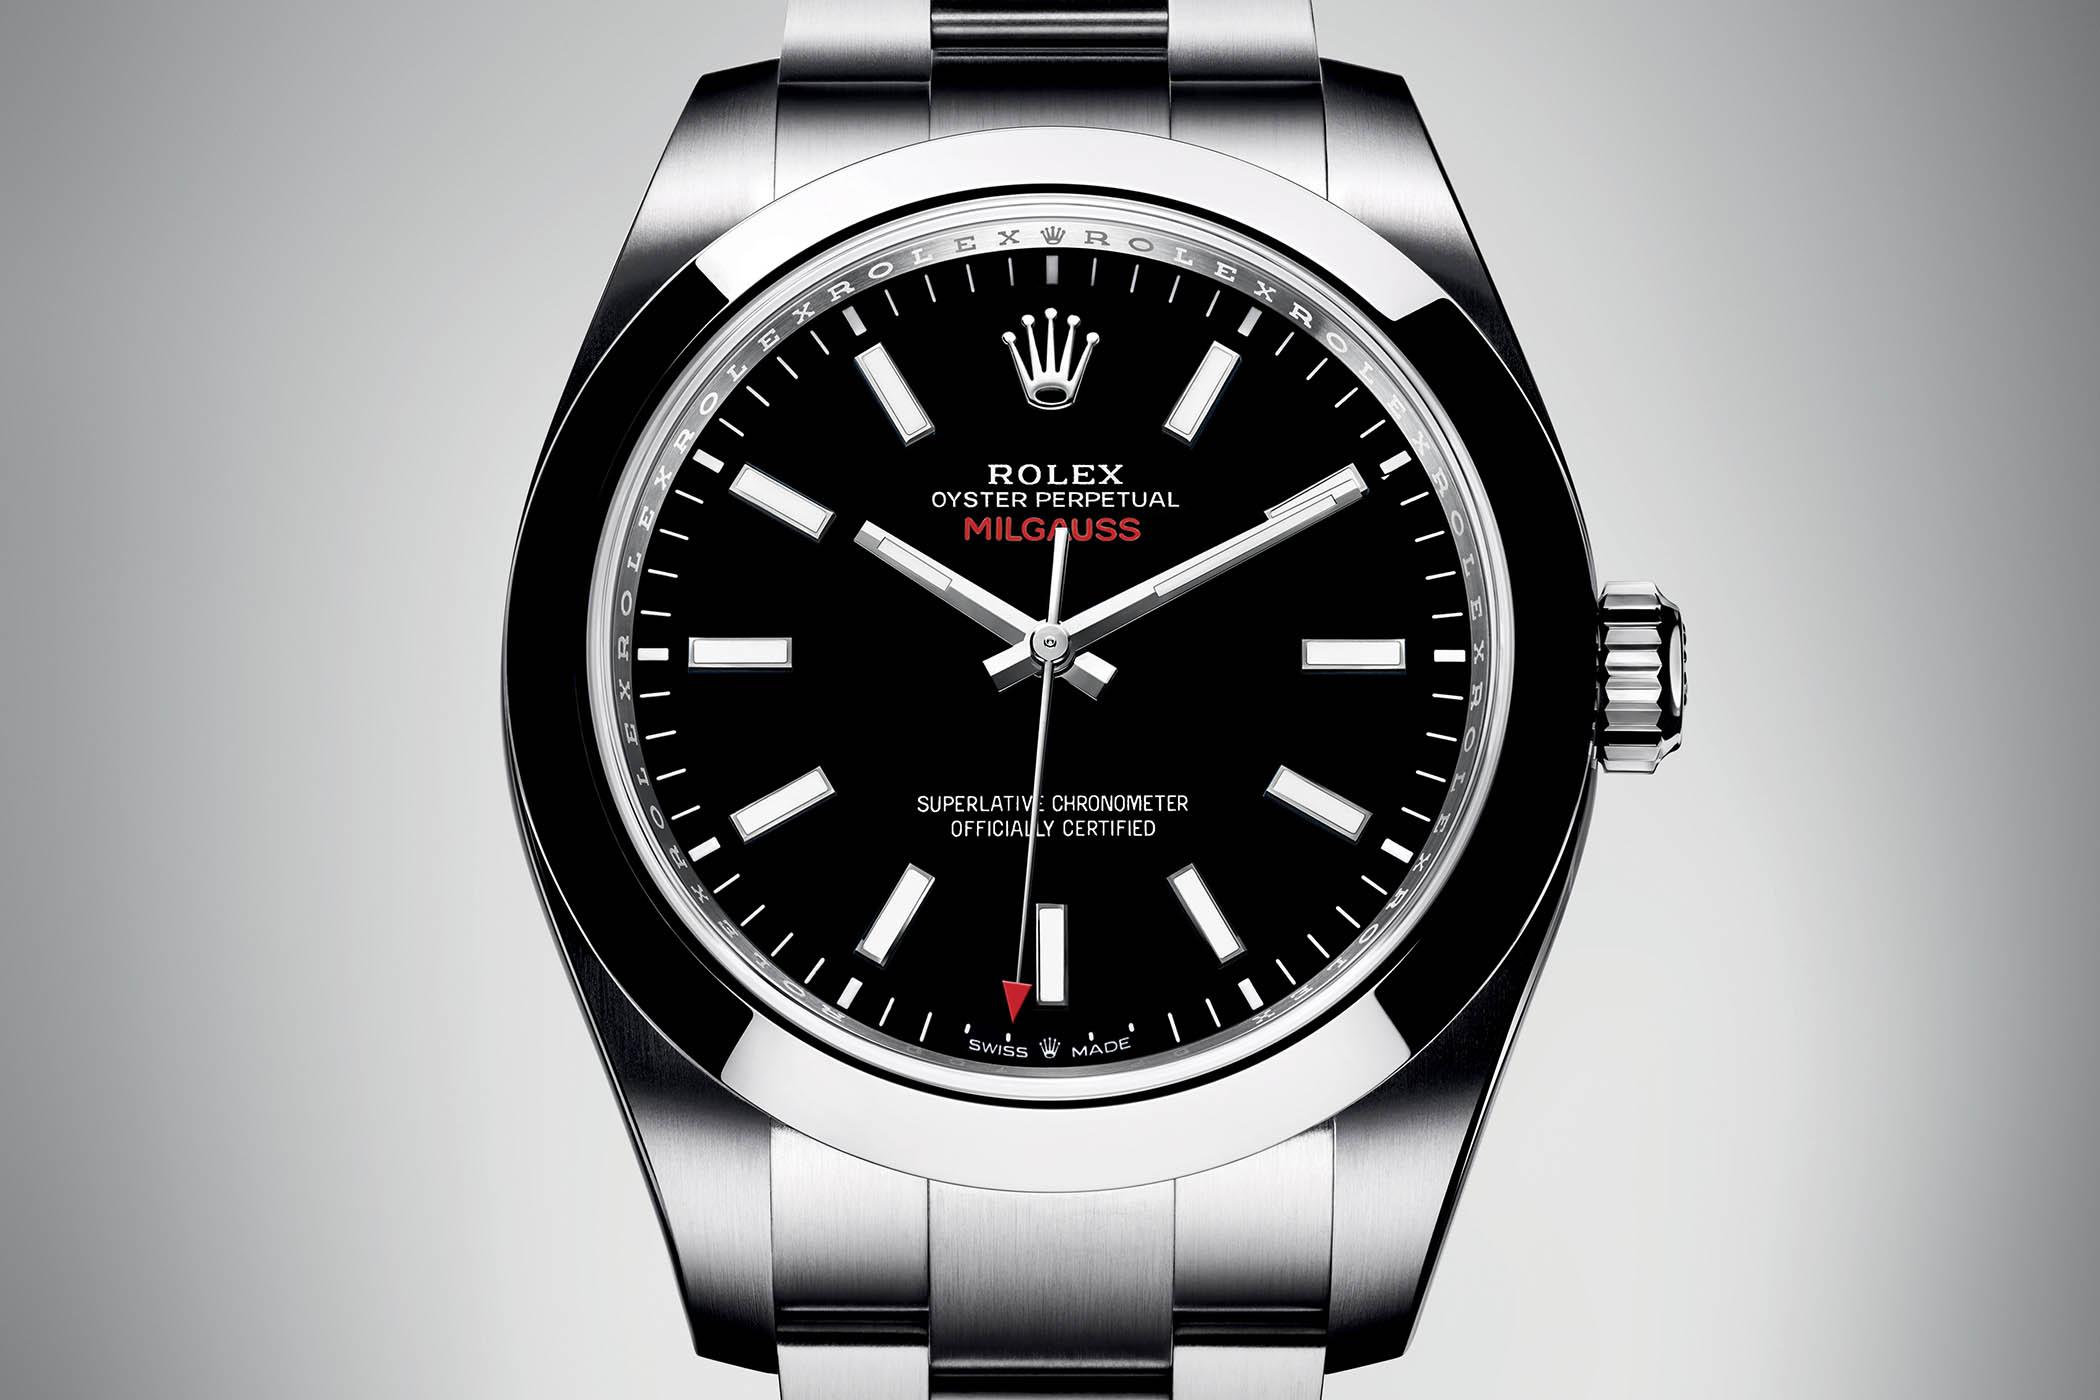 Rolex Milgauss 2019 ref 126400 tribute 1019 - Rolex Baselworld 2019 - Rolex 2019 Predictions